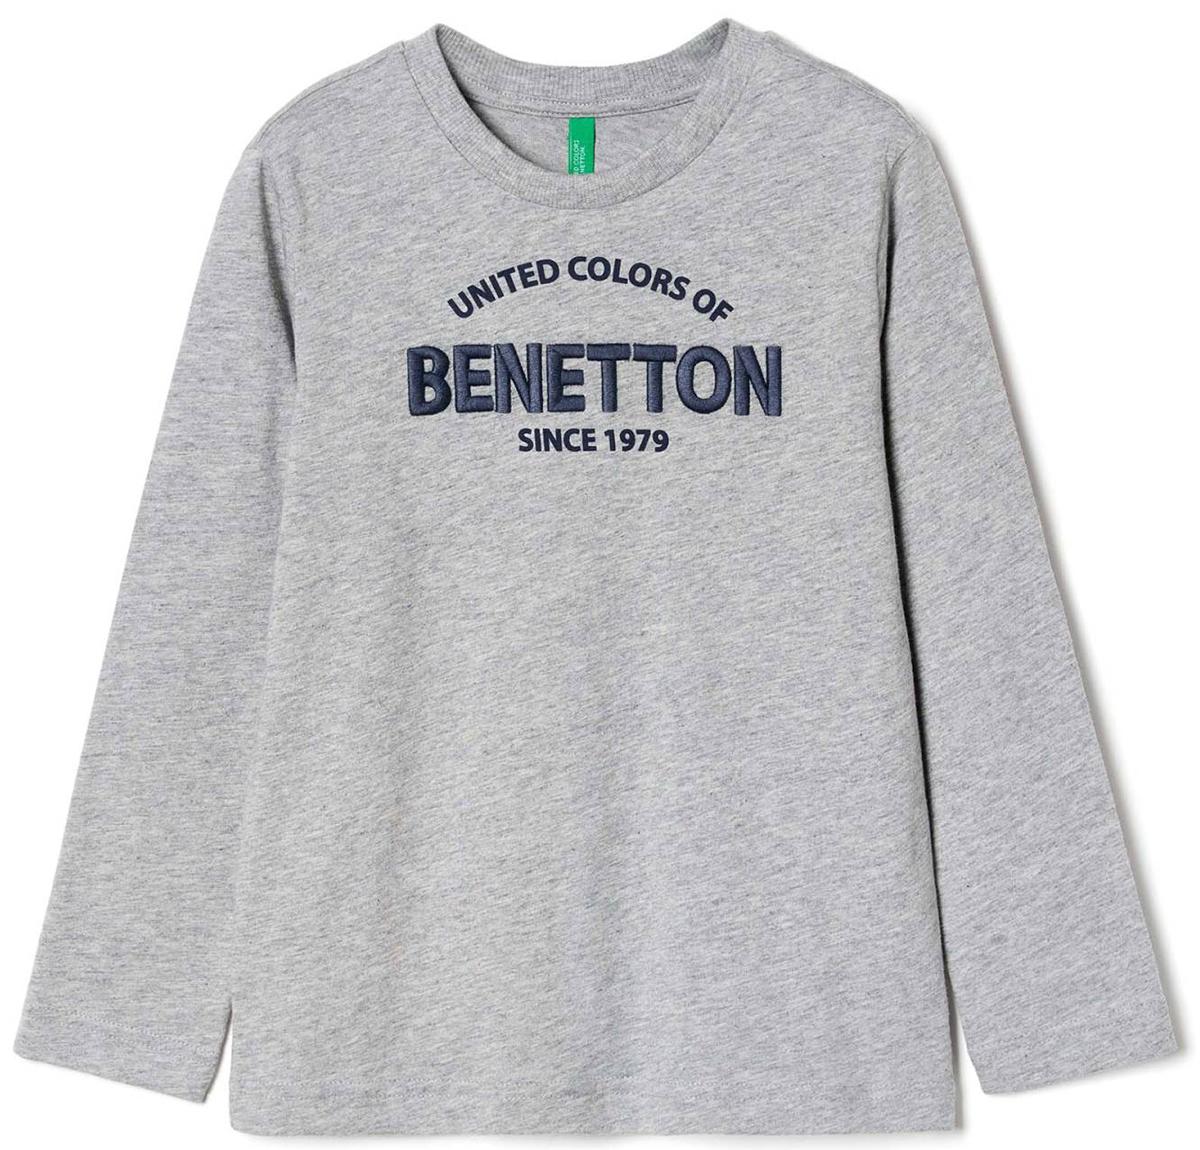 Майка для мальчиков United Colors of Benetton, цвет: серый. 3096C13GW_501. Размер 1603096C13GW_501